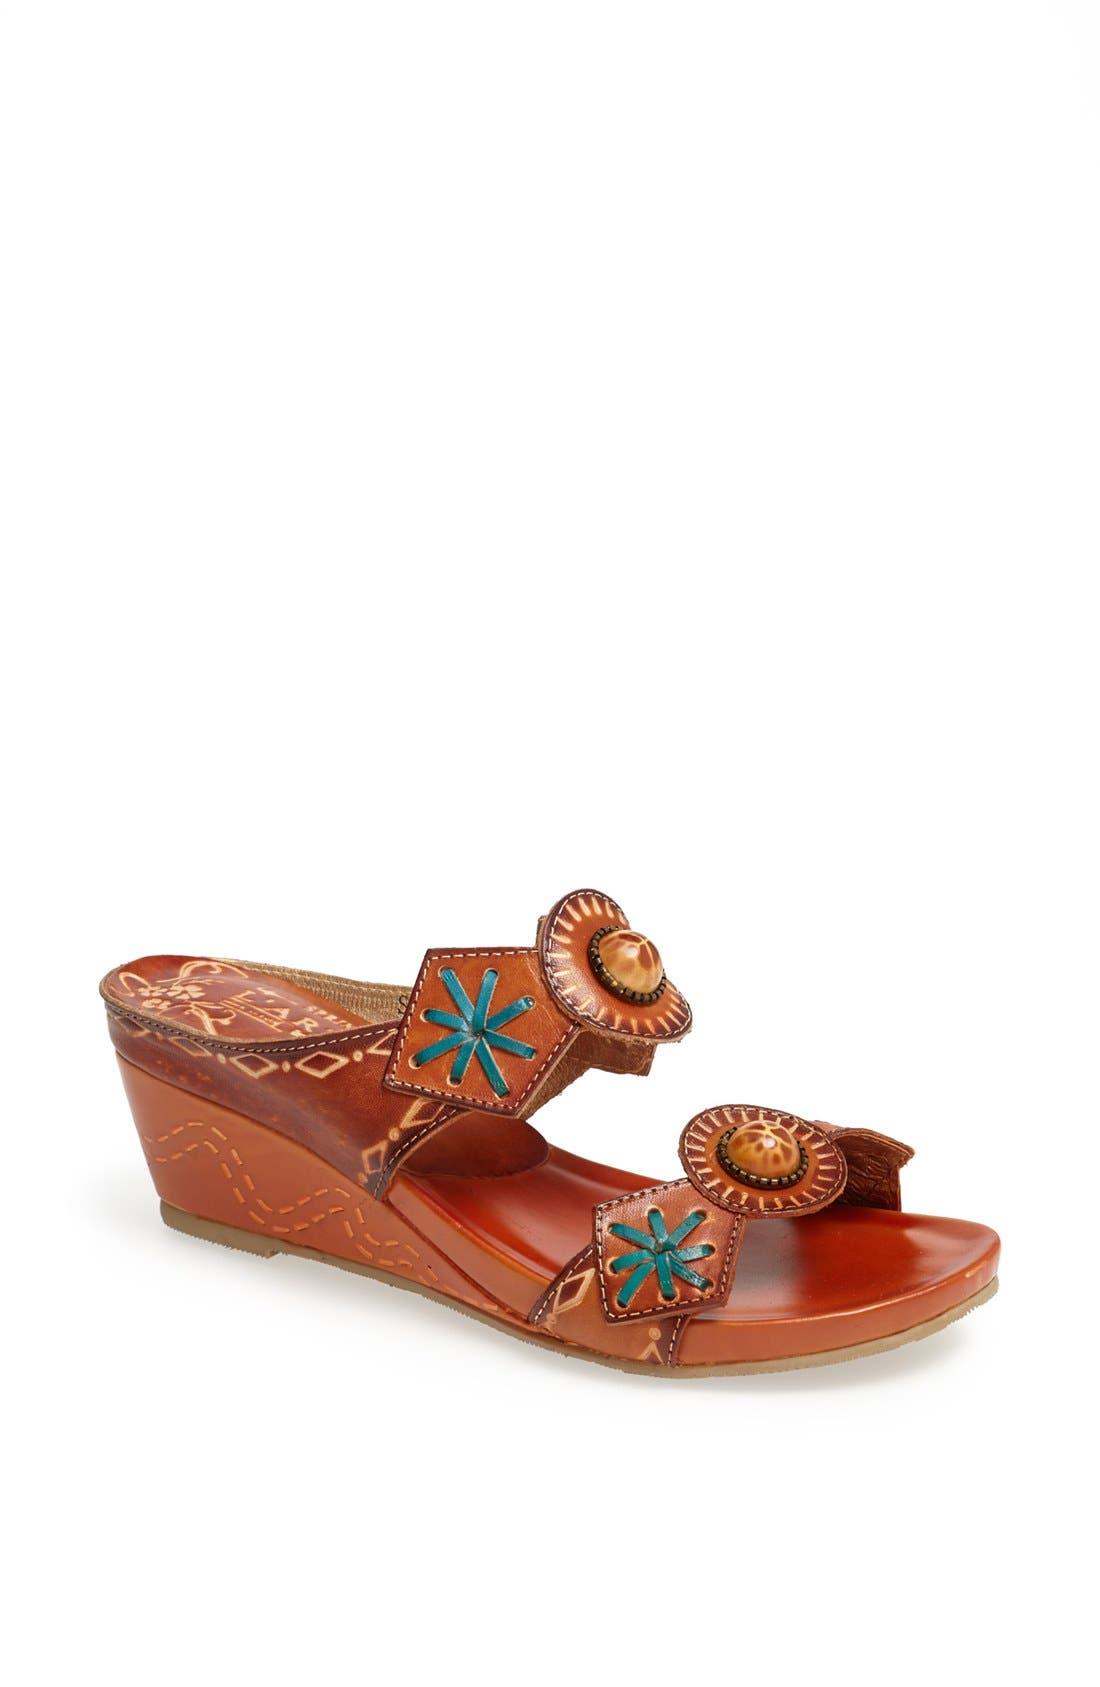 Alternate Image 1 Selected - Spring Step 'Sesame' Leather Wedge Sandal